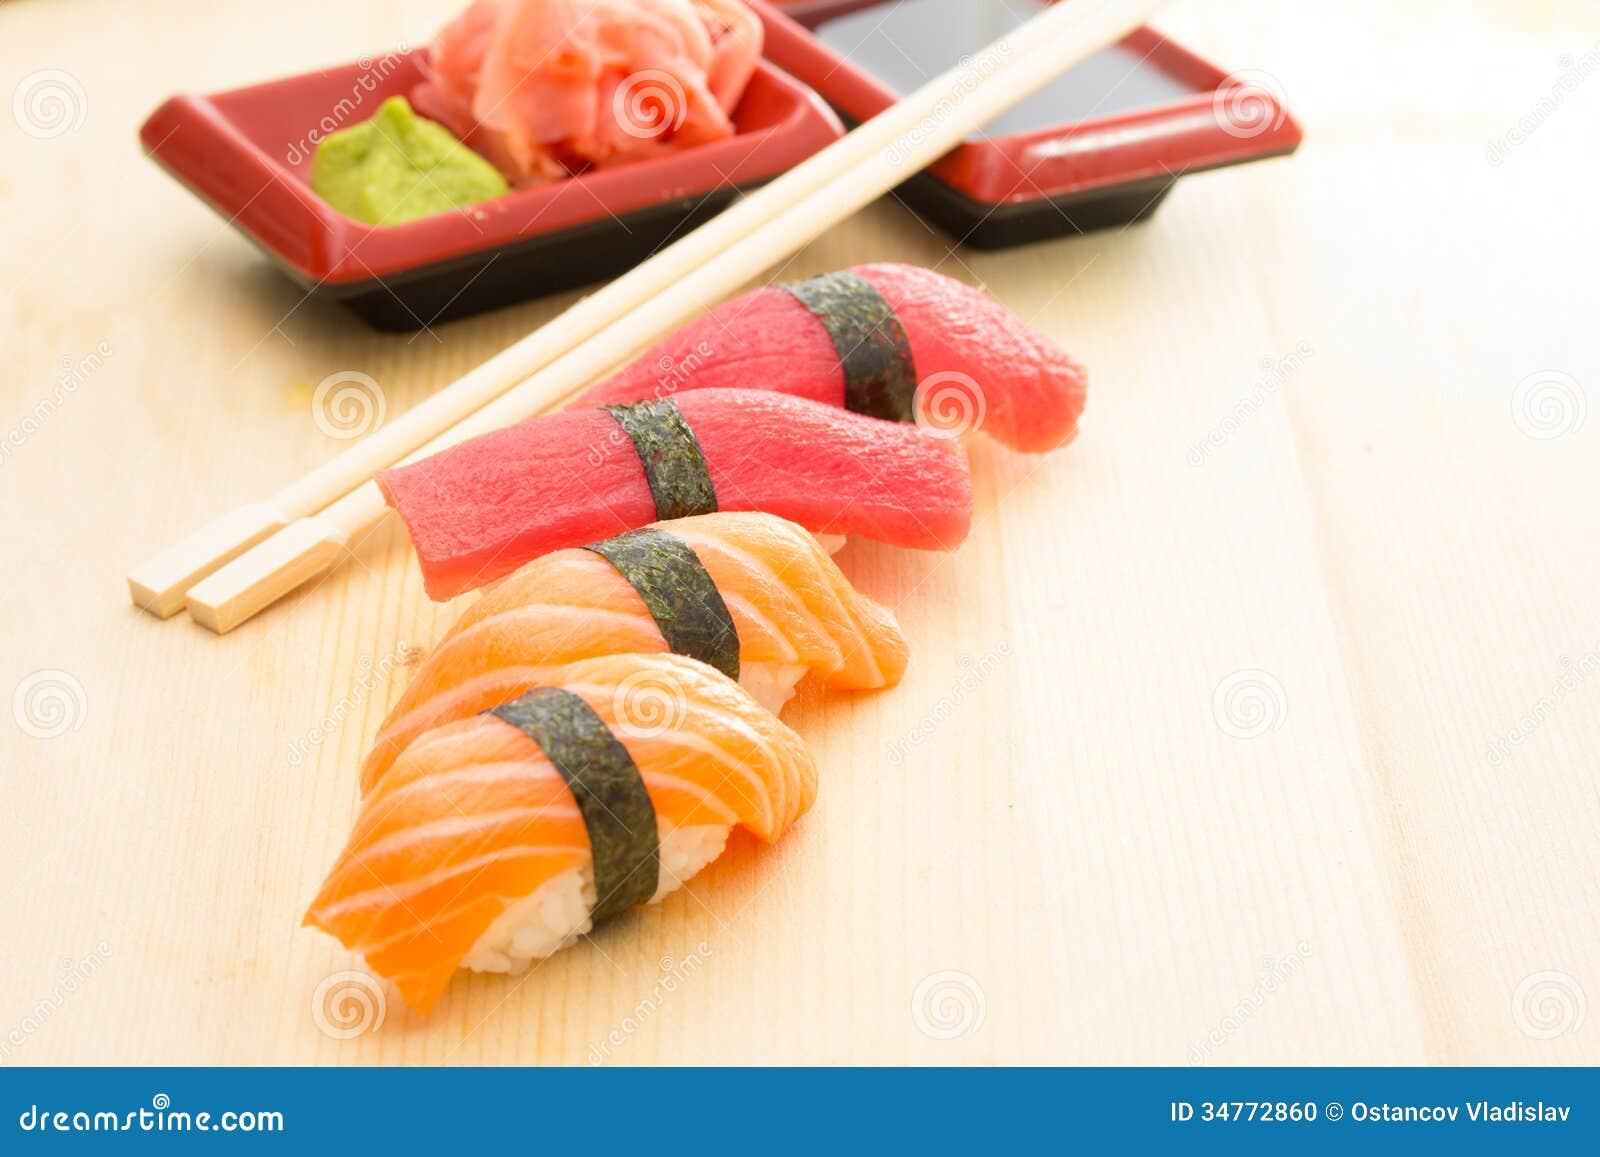 how to cut tuna for sushi nigiri